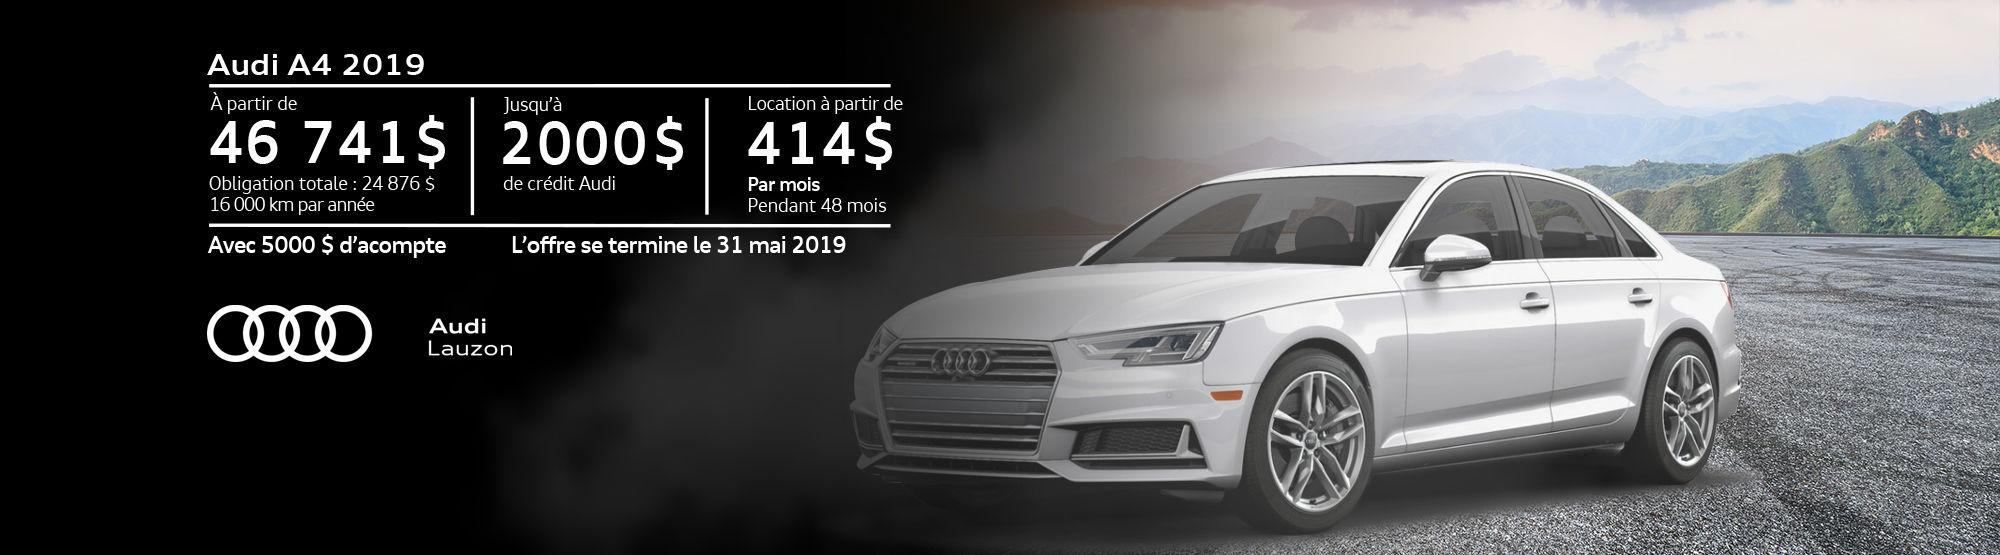 Audi A4 mai 2019